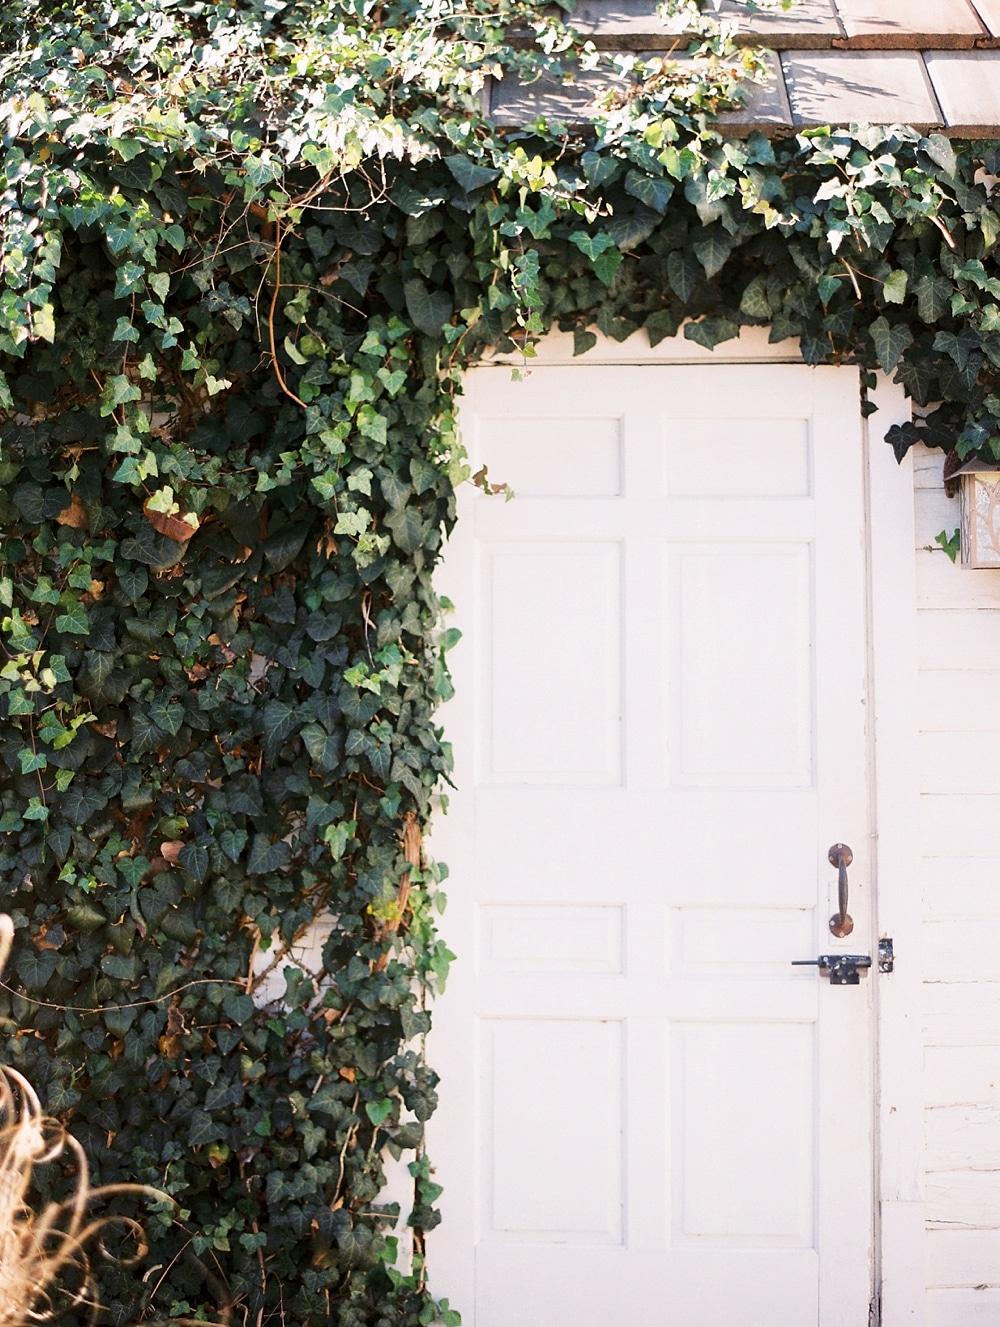 Kristin-La-Voie-Photography-Austin-Wedding-Photographer-barr-mansion (8 of 86)